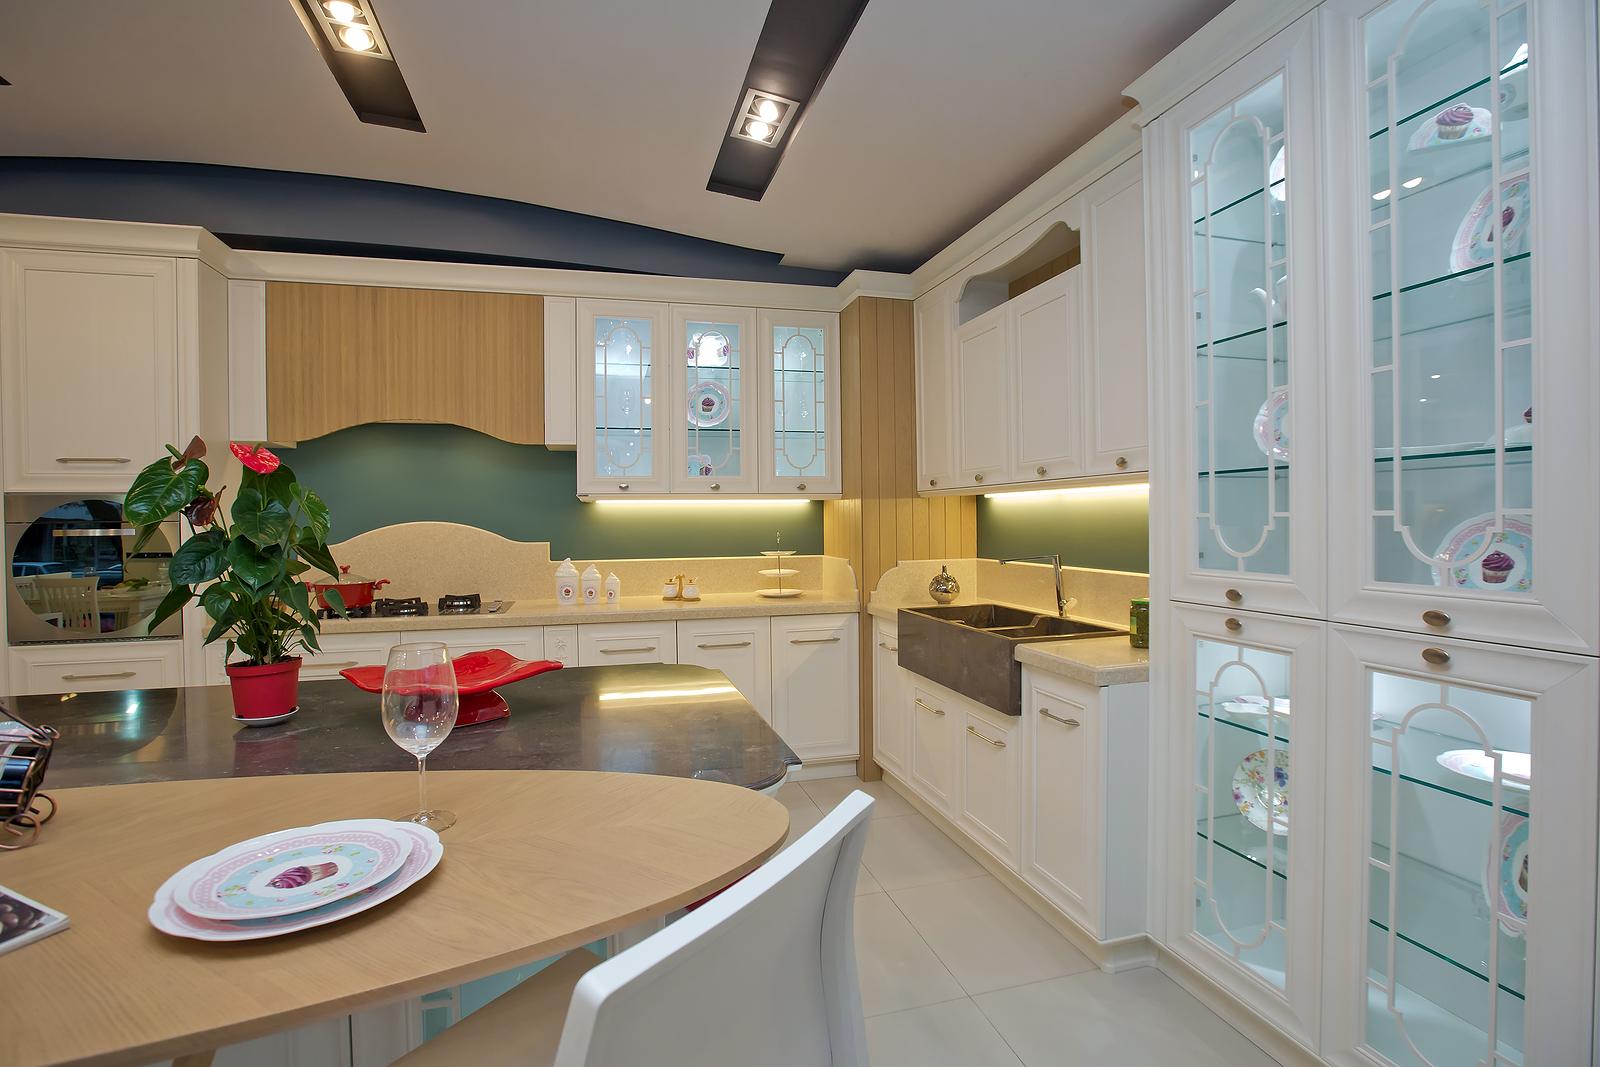 5 Distinguishing Characteristics of Italian Interior Design